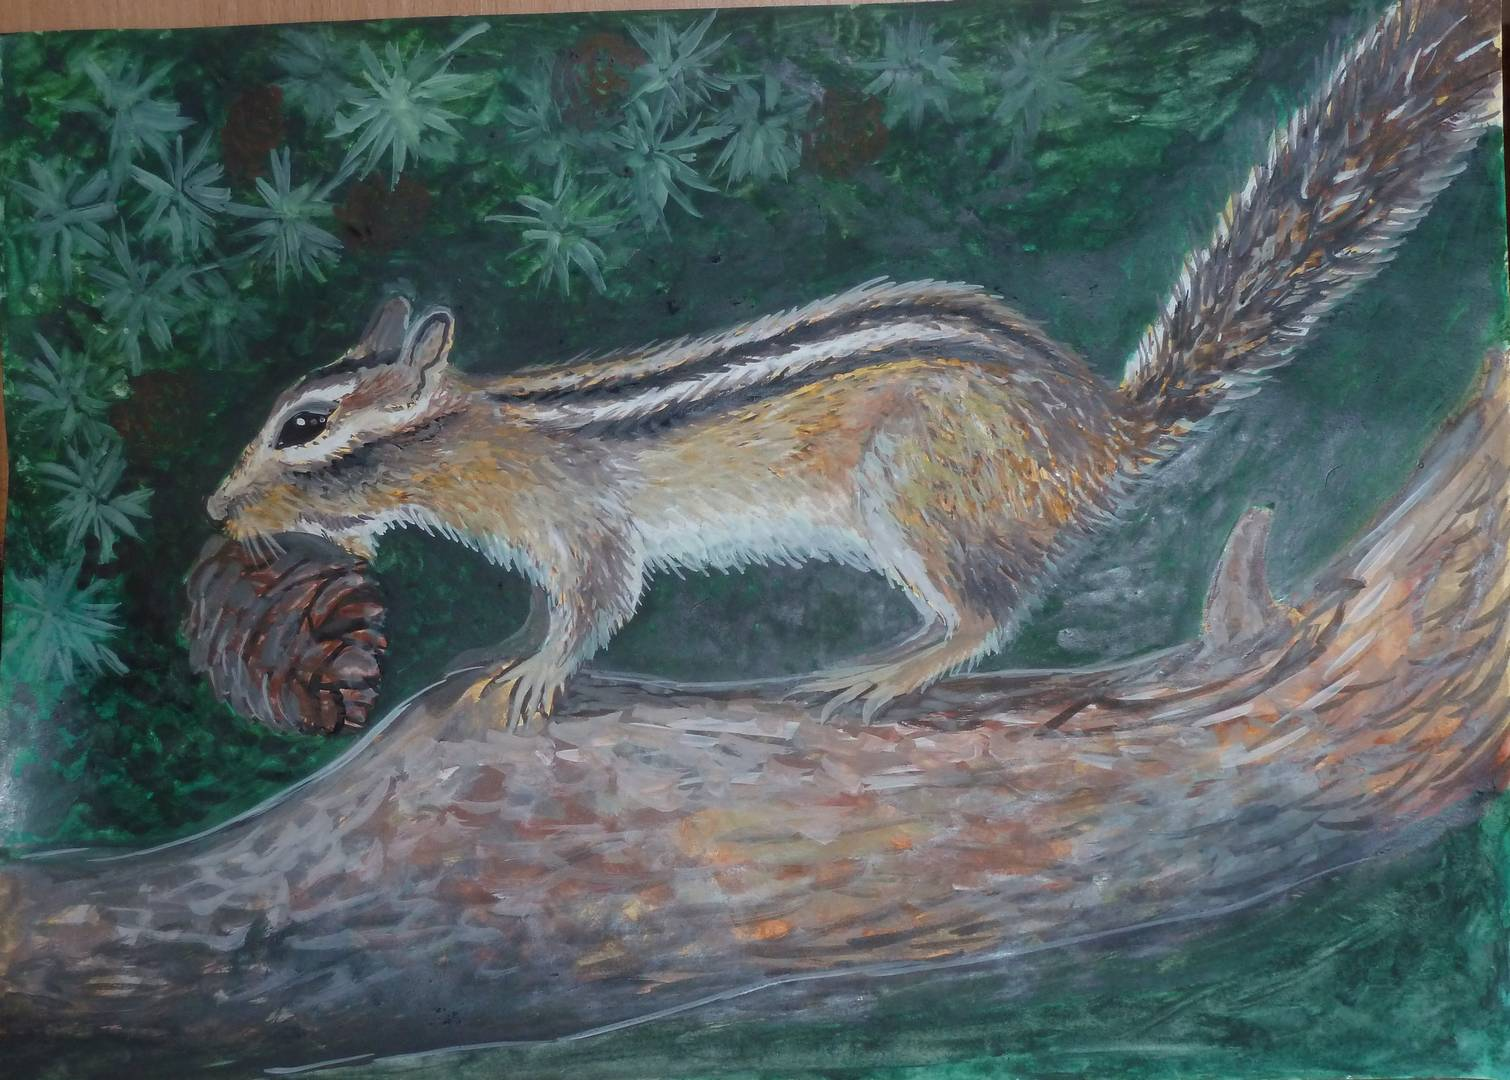 Бурундук. Рисунок Вероники Селивановой.